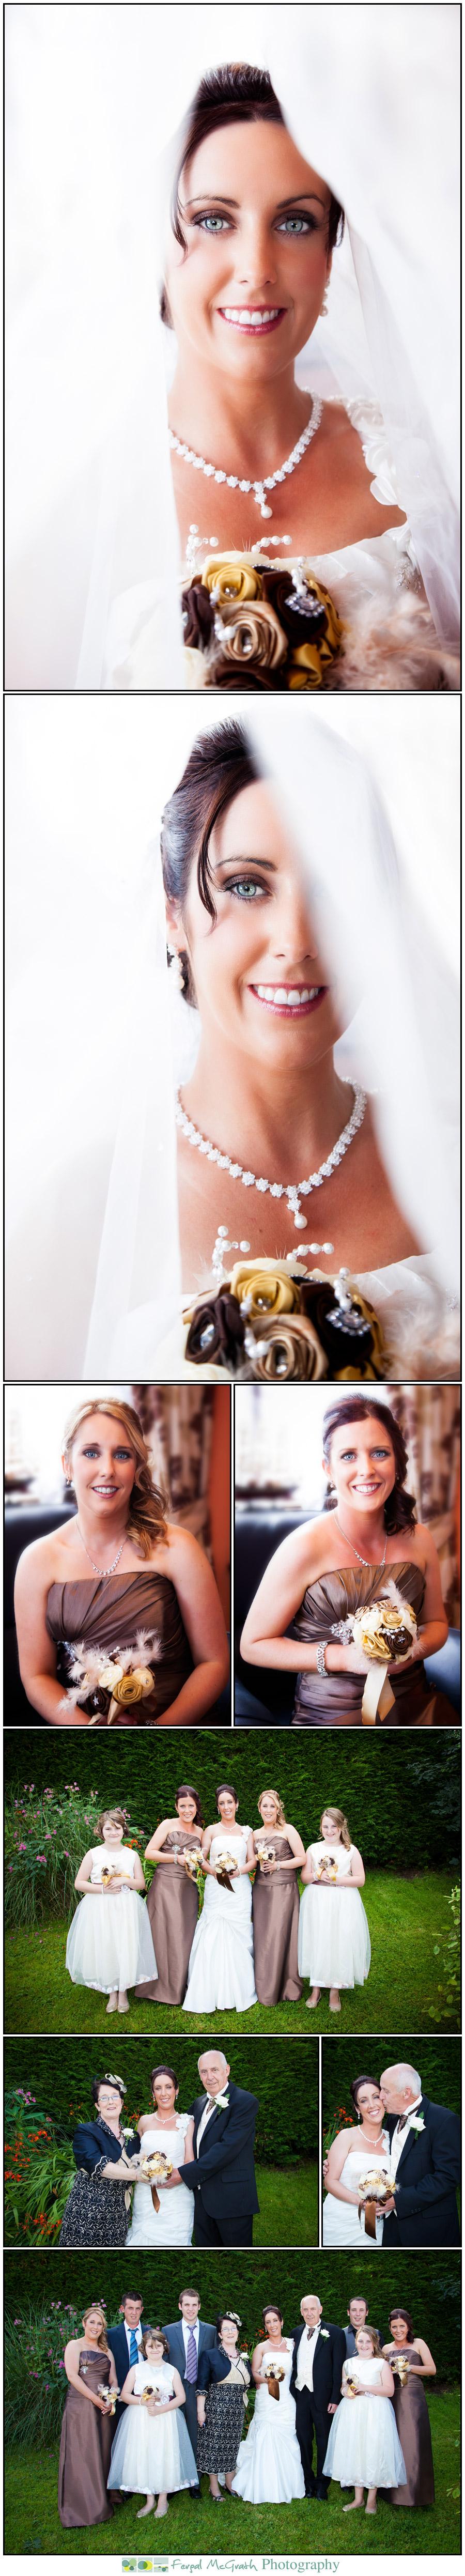 Leitrim wedding photographers Breda and Paul Hickman wedding